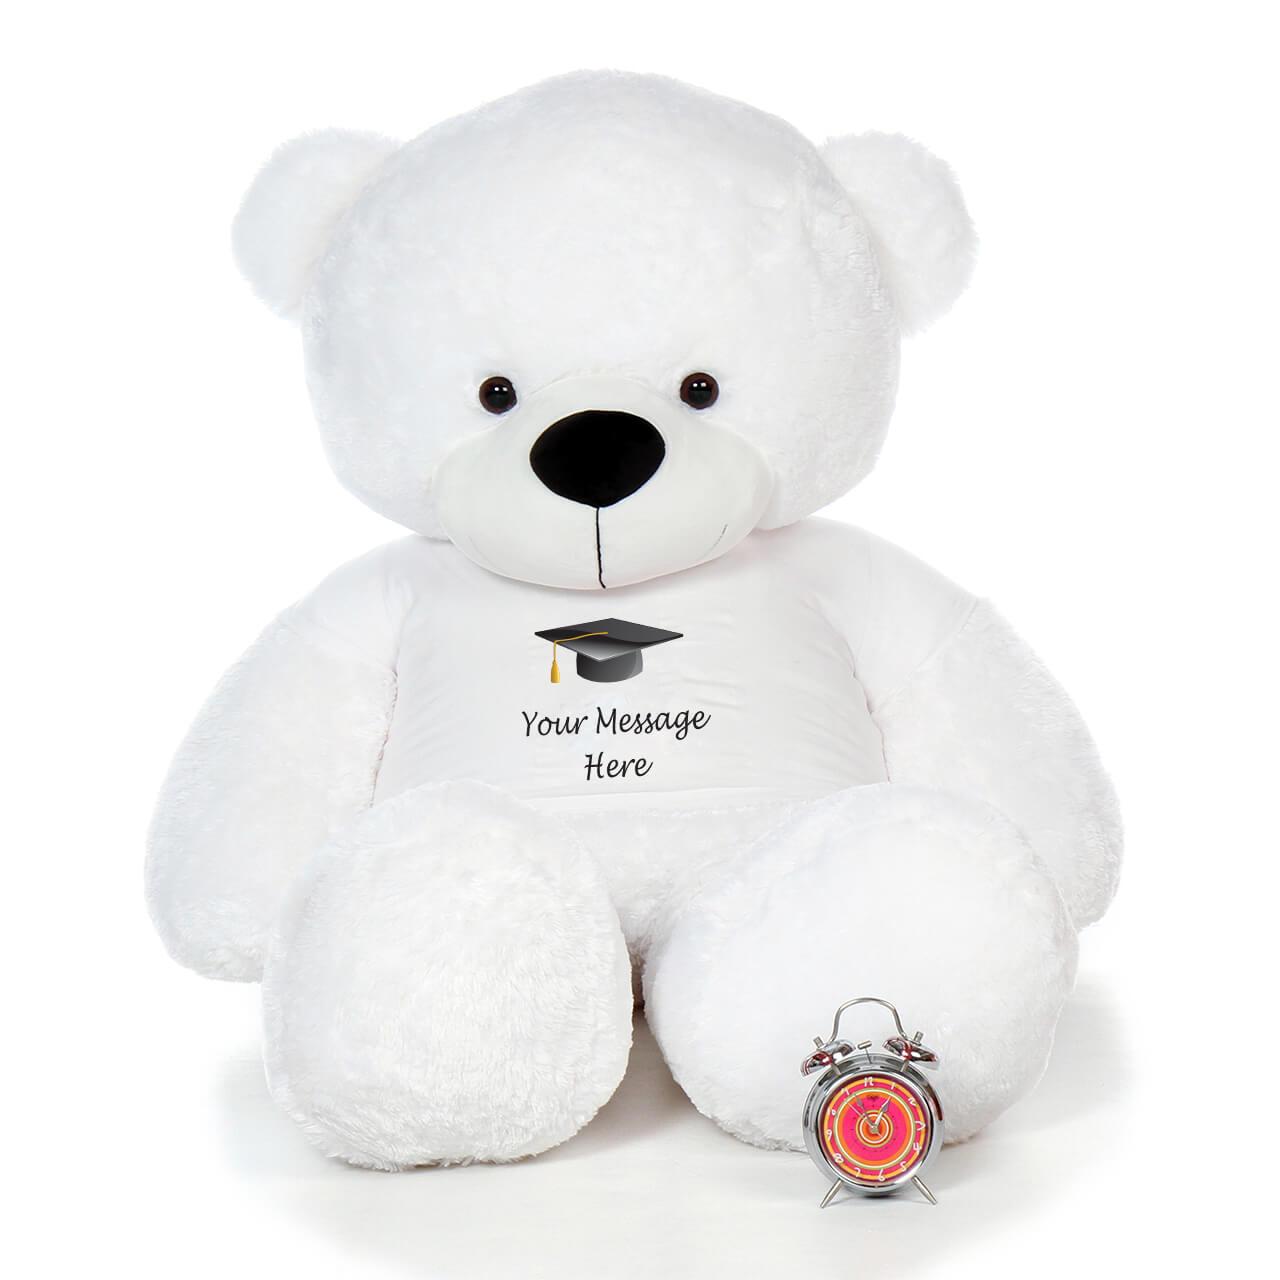 6 Foot White Teddy Bear for Graduation Gift